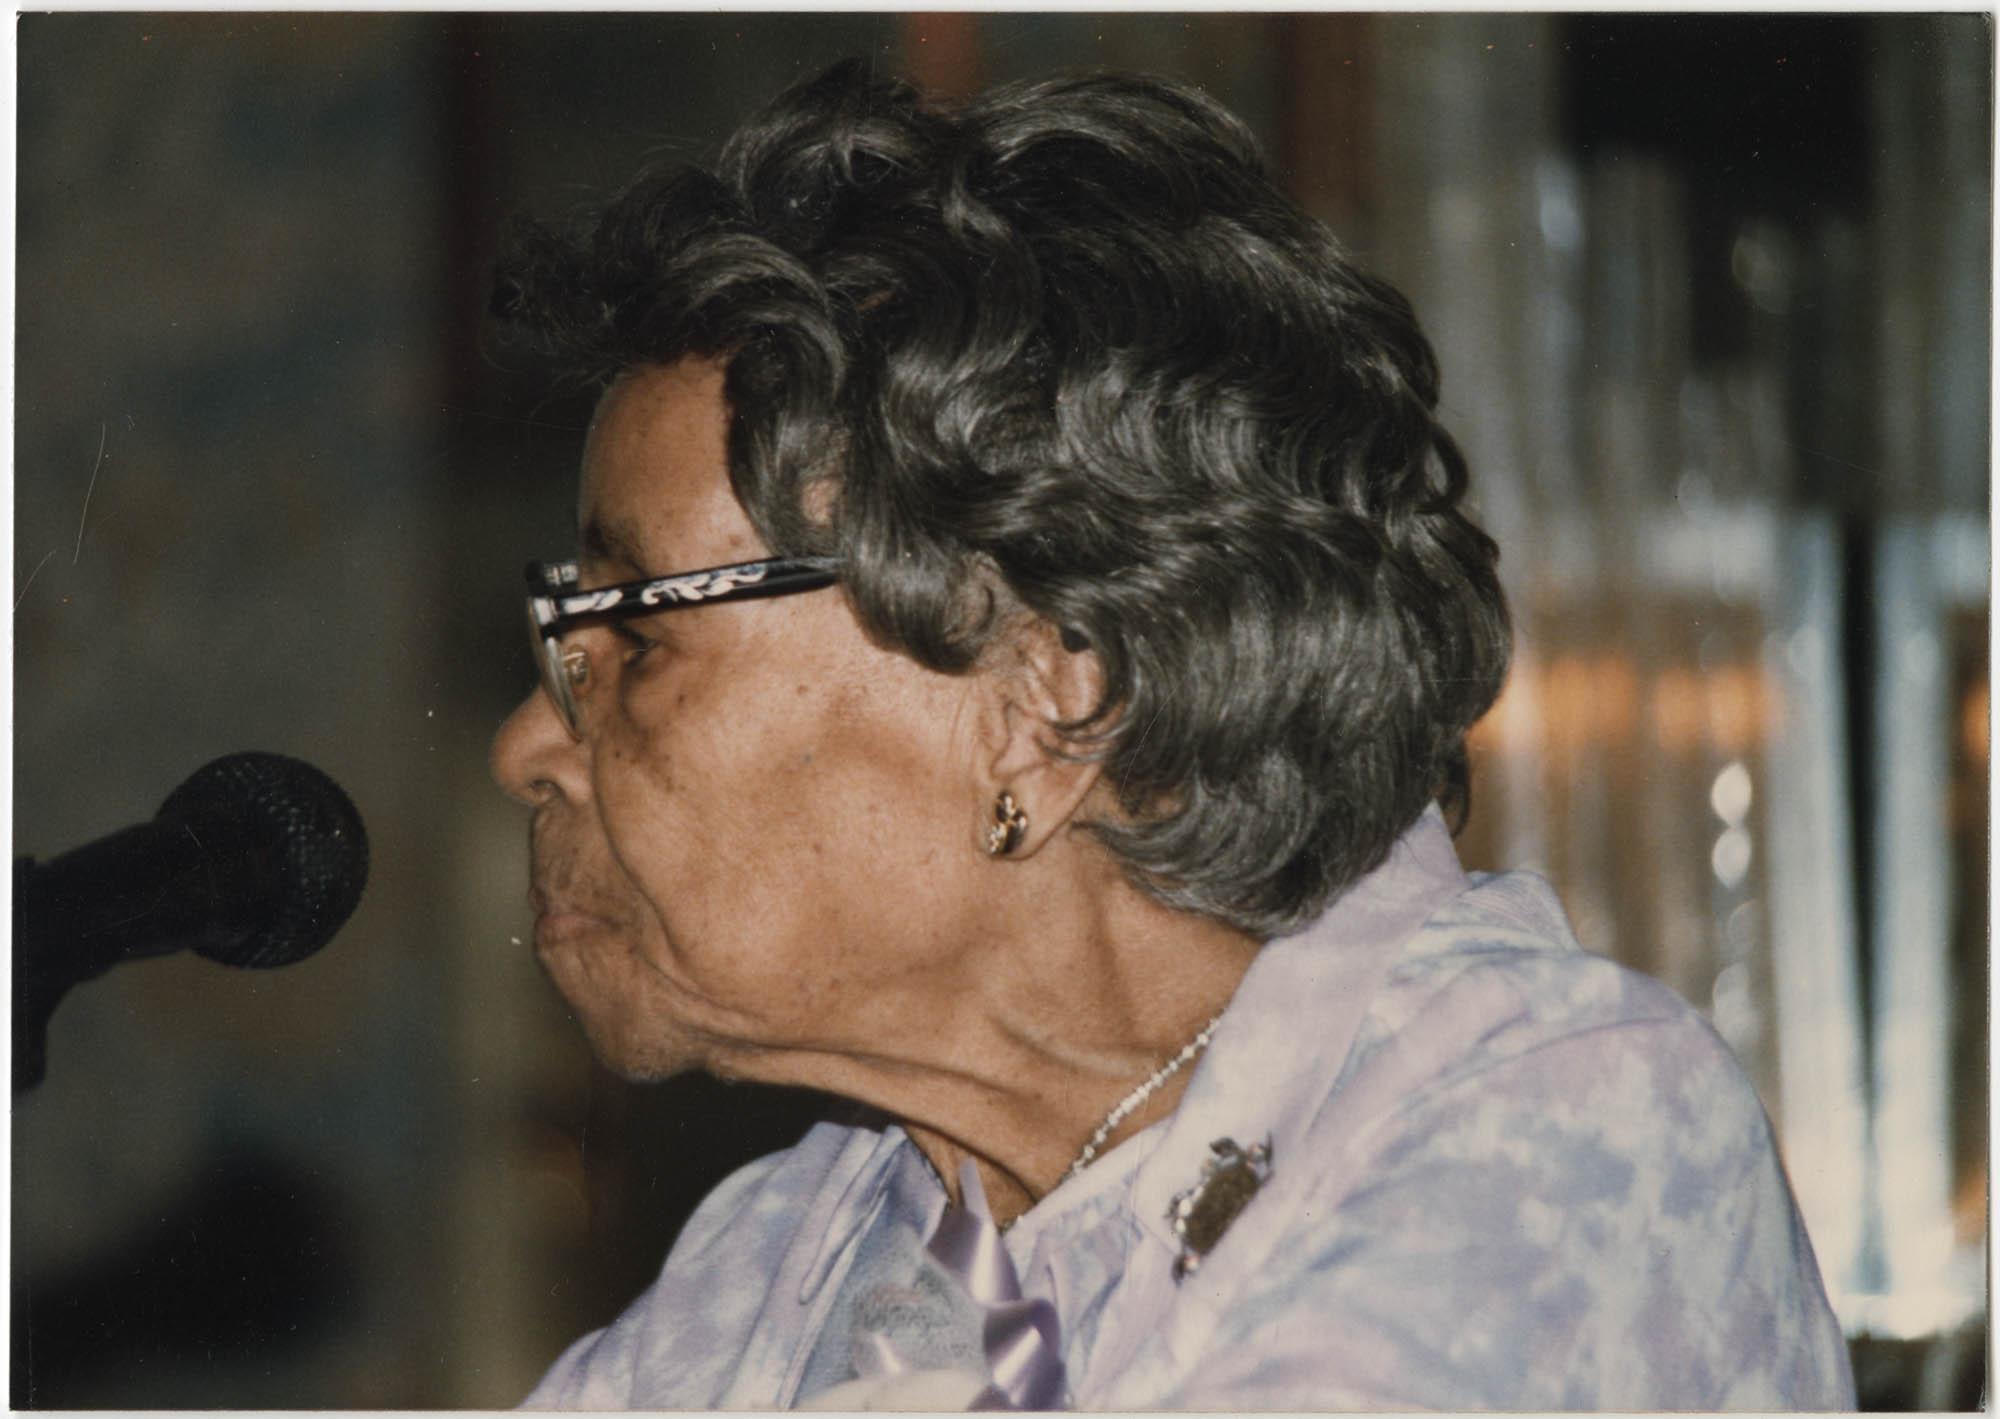 Photograph of Septima P. Clark